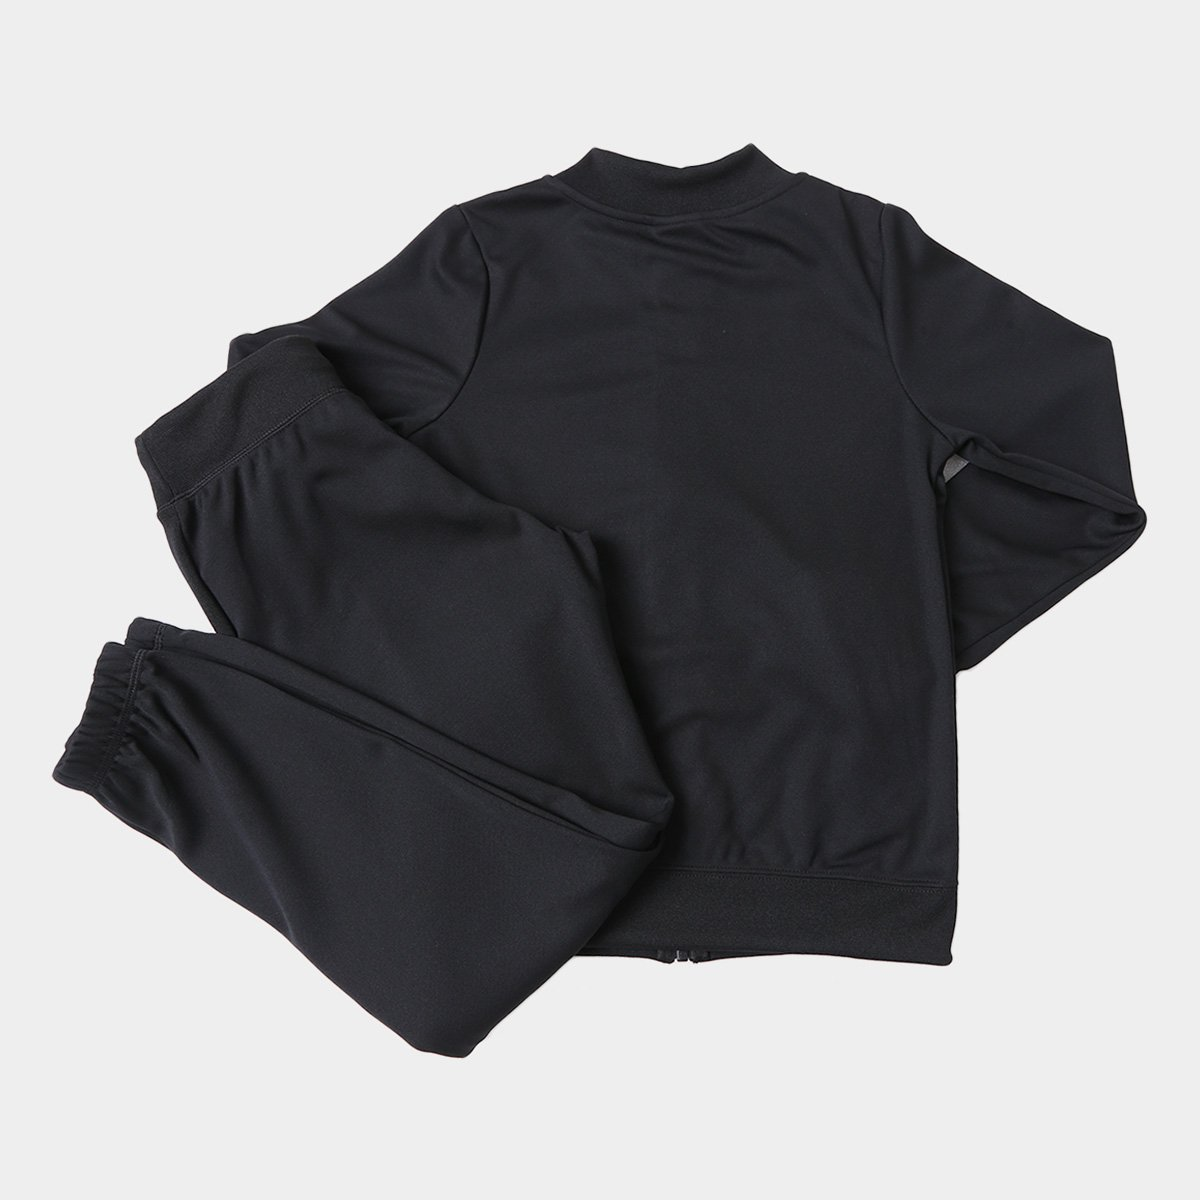 Nike Sportswear Suit Preto e Feminino Branco Agasalho Infantil Track gFnxnUq